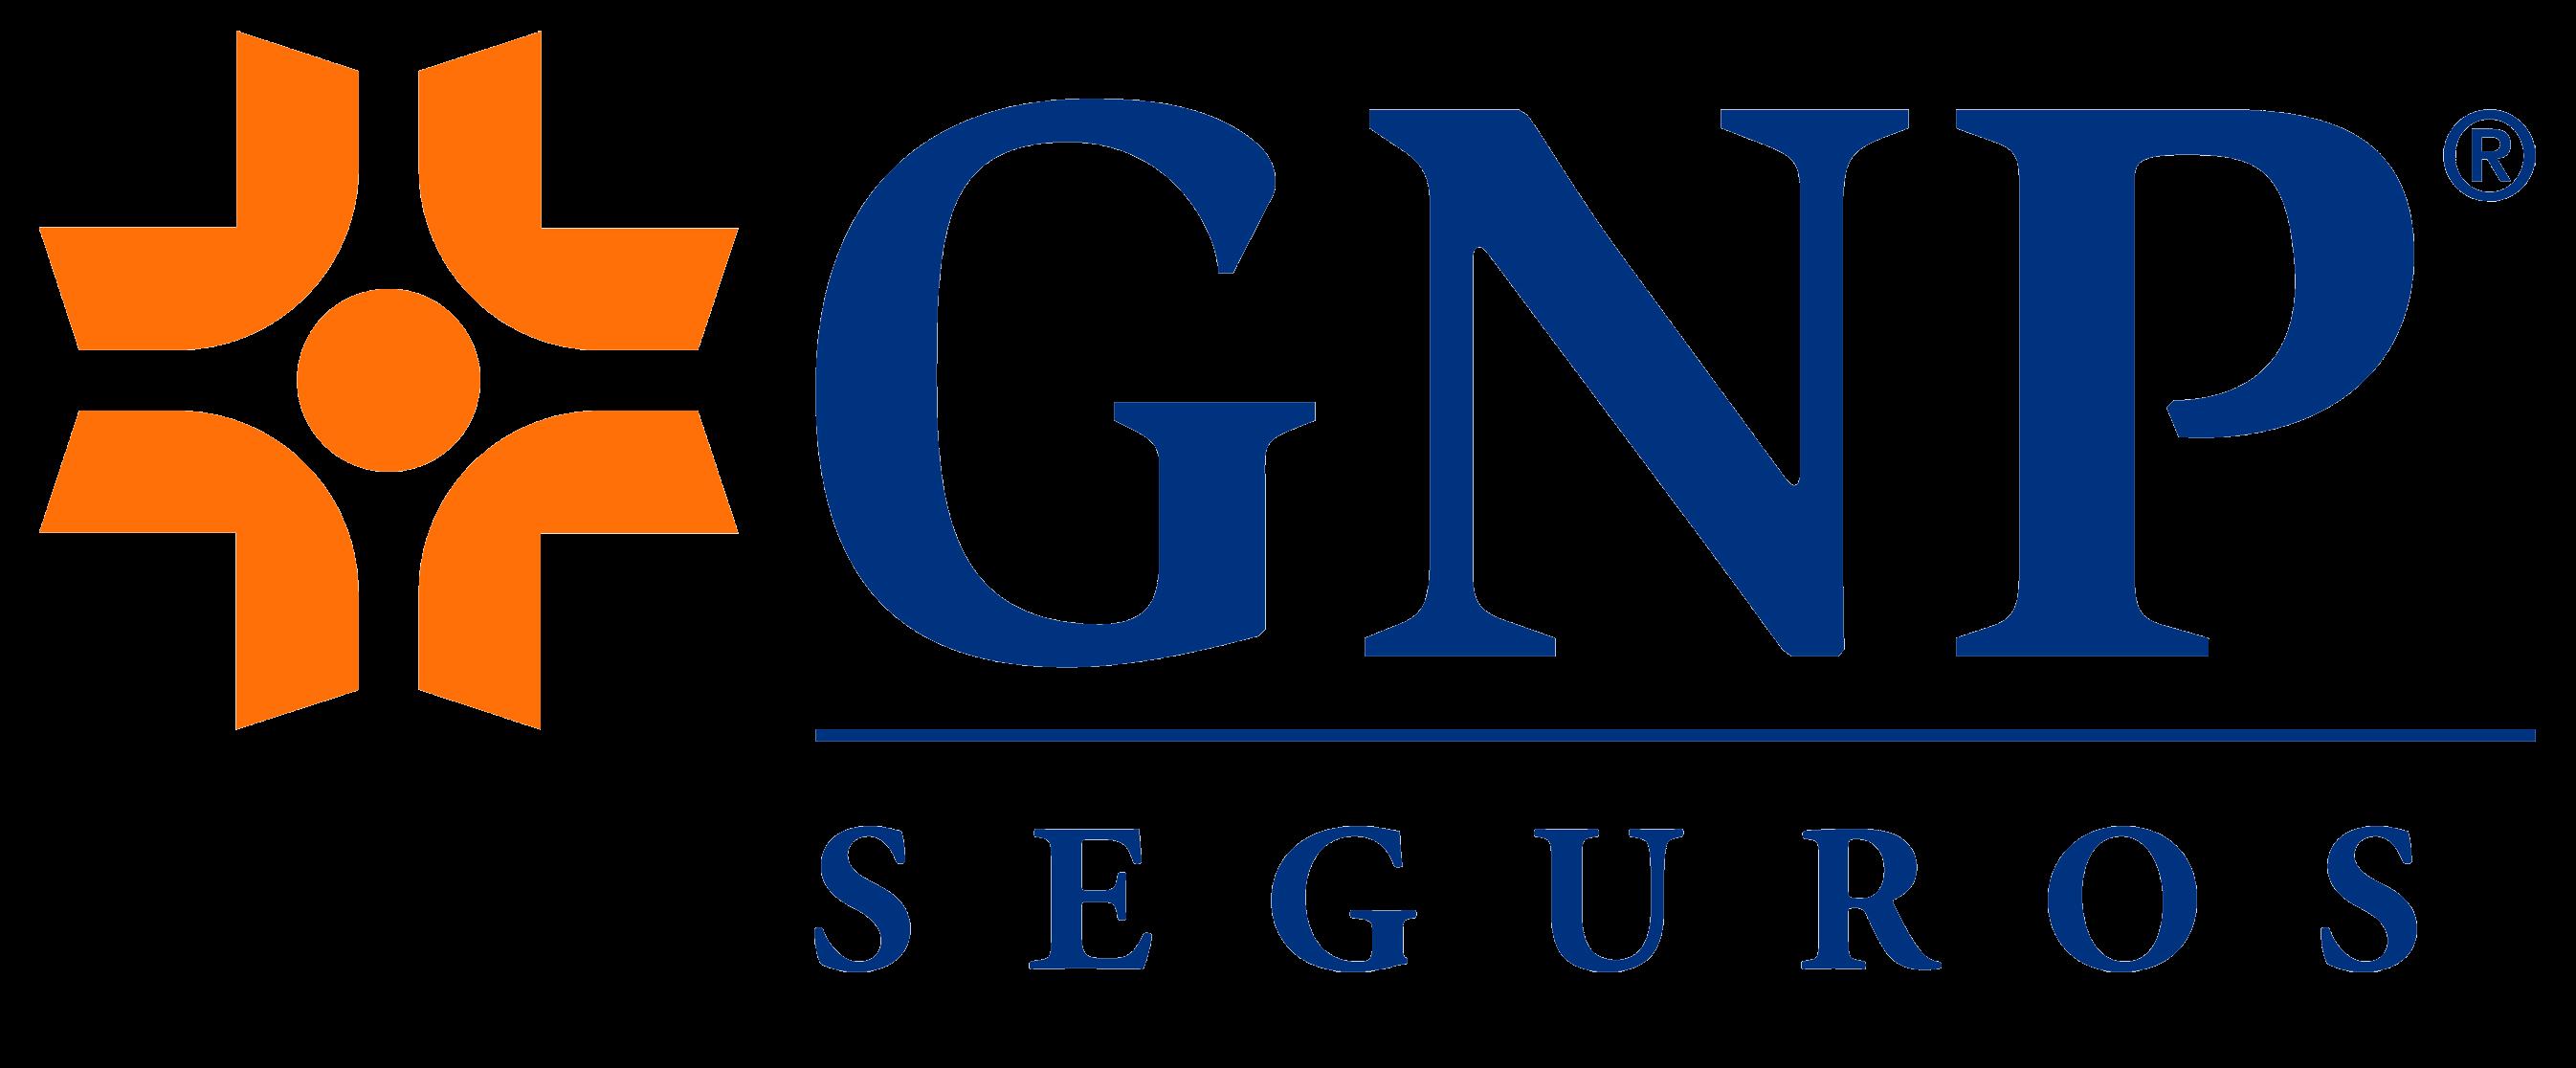 kisspng-gross-national-product-grupo-nacional-provincial-s-insurance-5b45d3b22d1704.7399535315313028341847